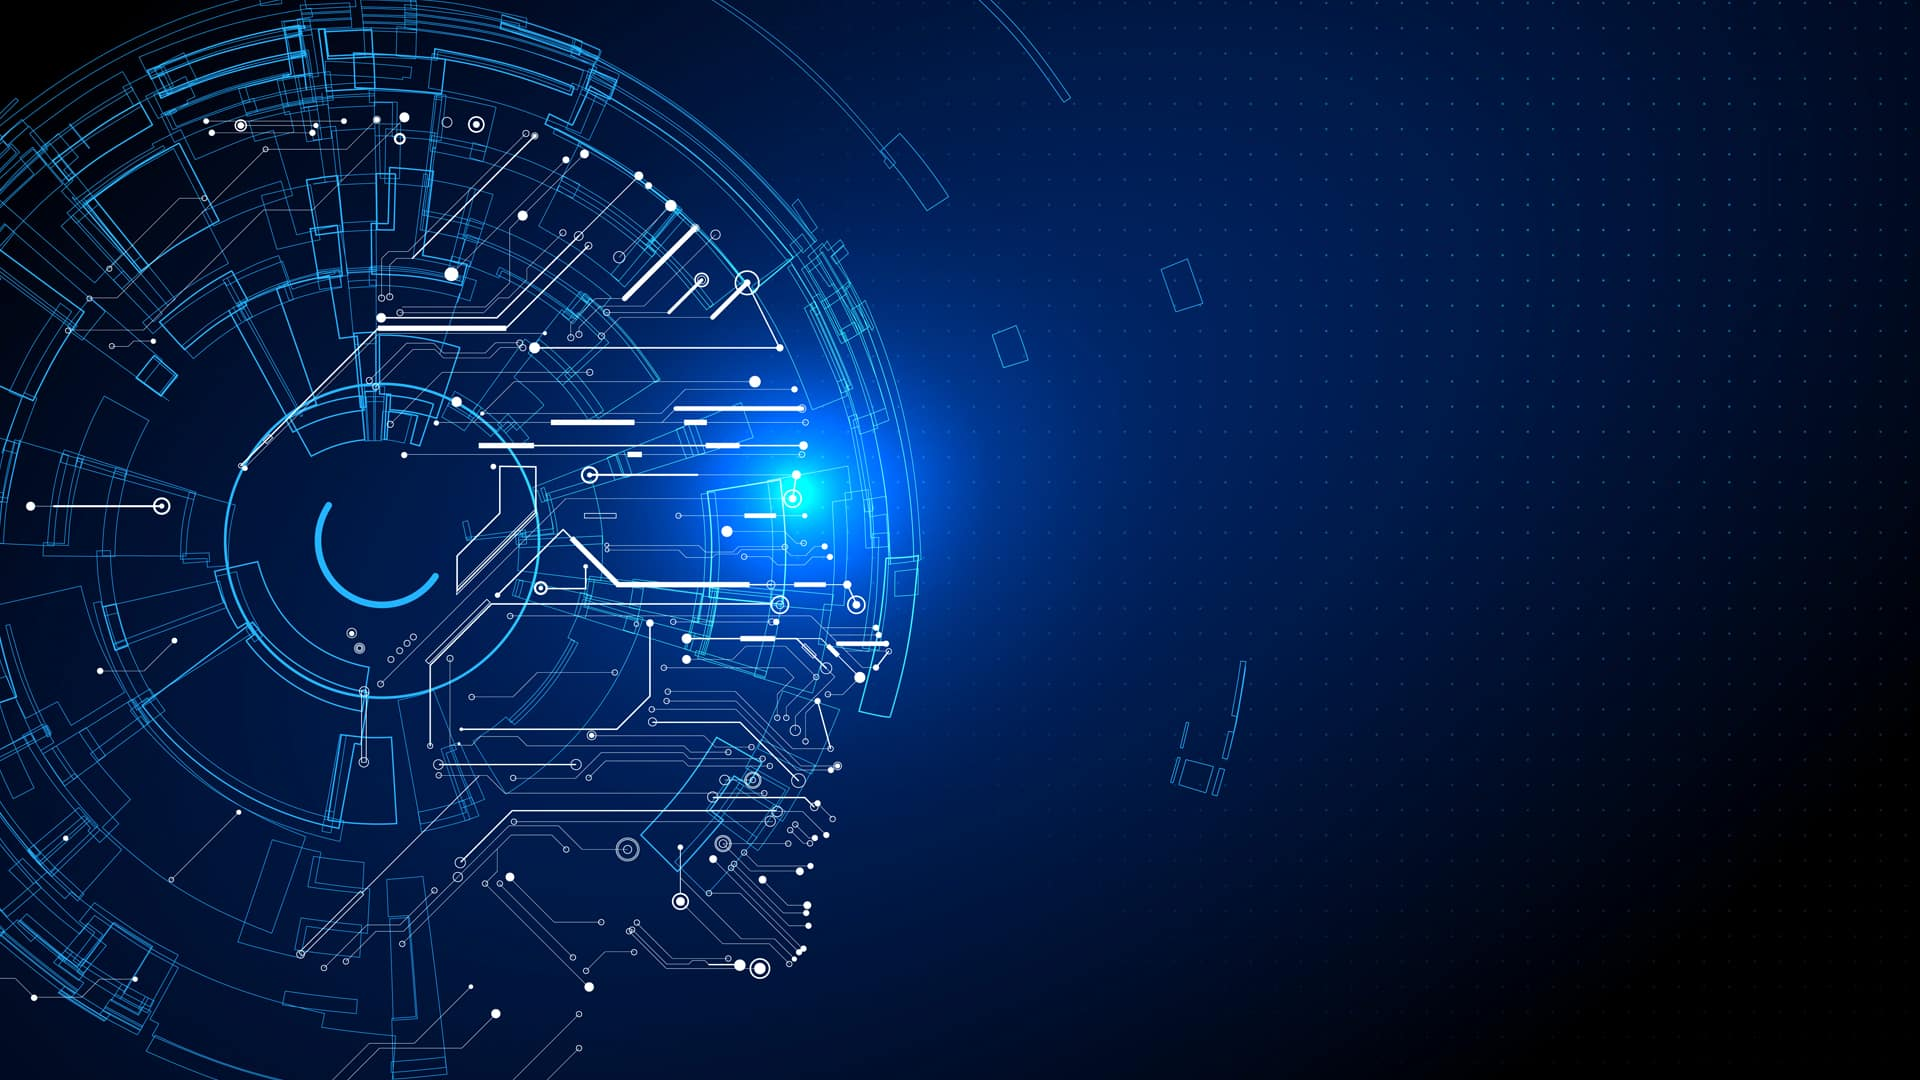 Infosys partners Amazon web services to develop quantum computing capabilities